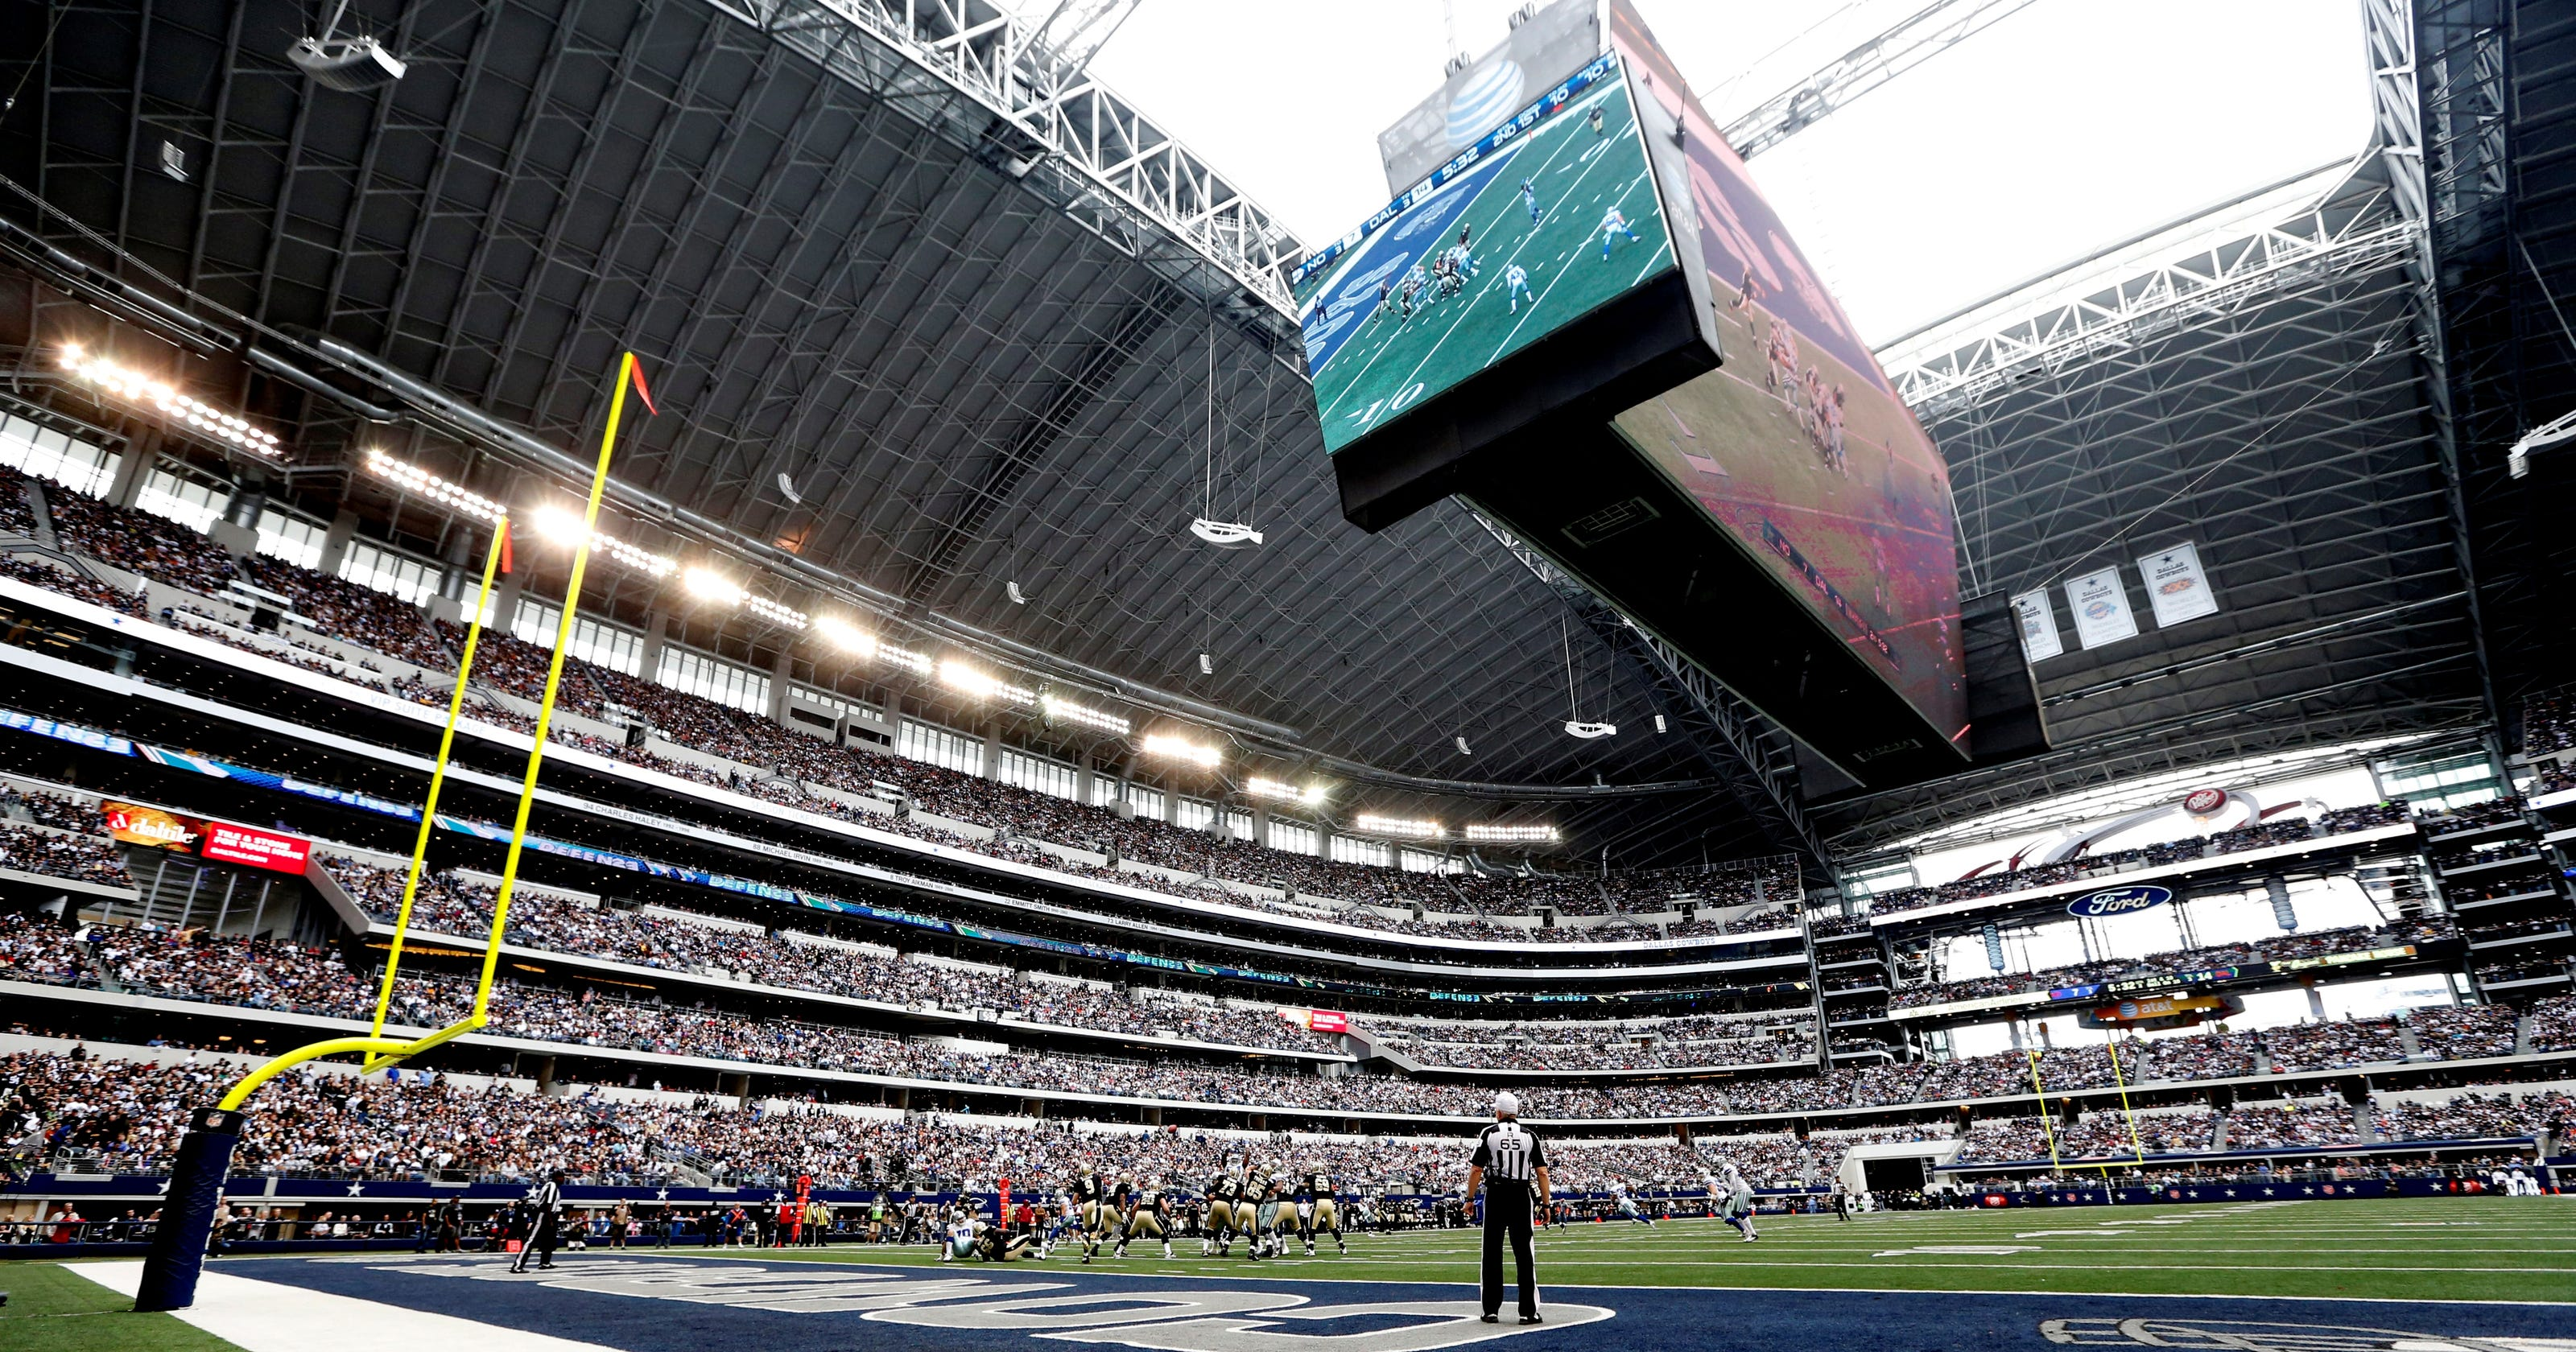 cowboys stadium to be renamed atampt stadium